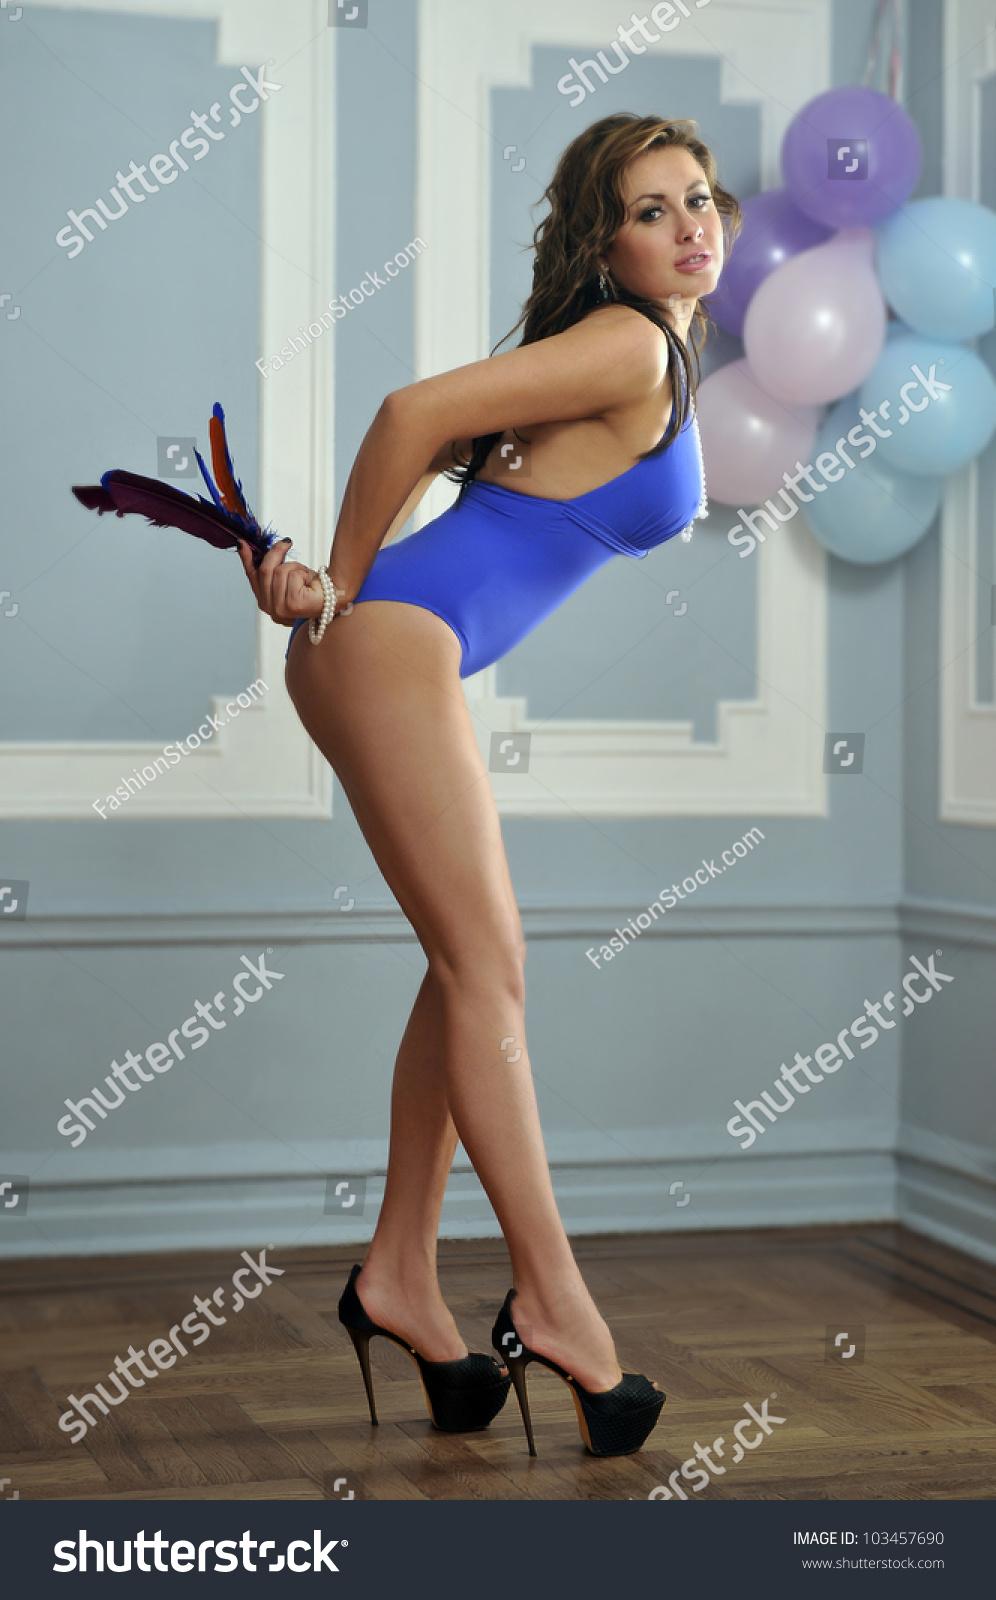 nude girls with softball legs